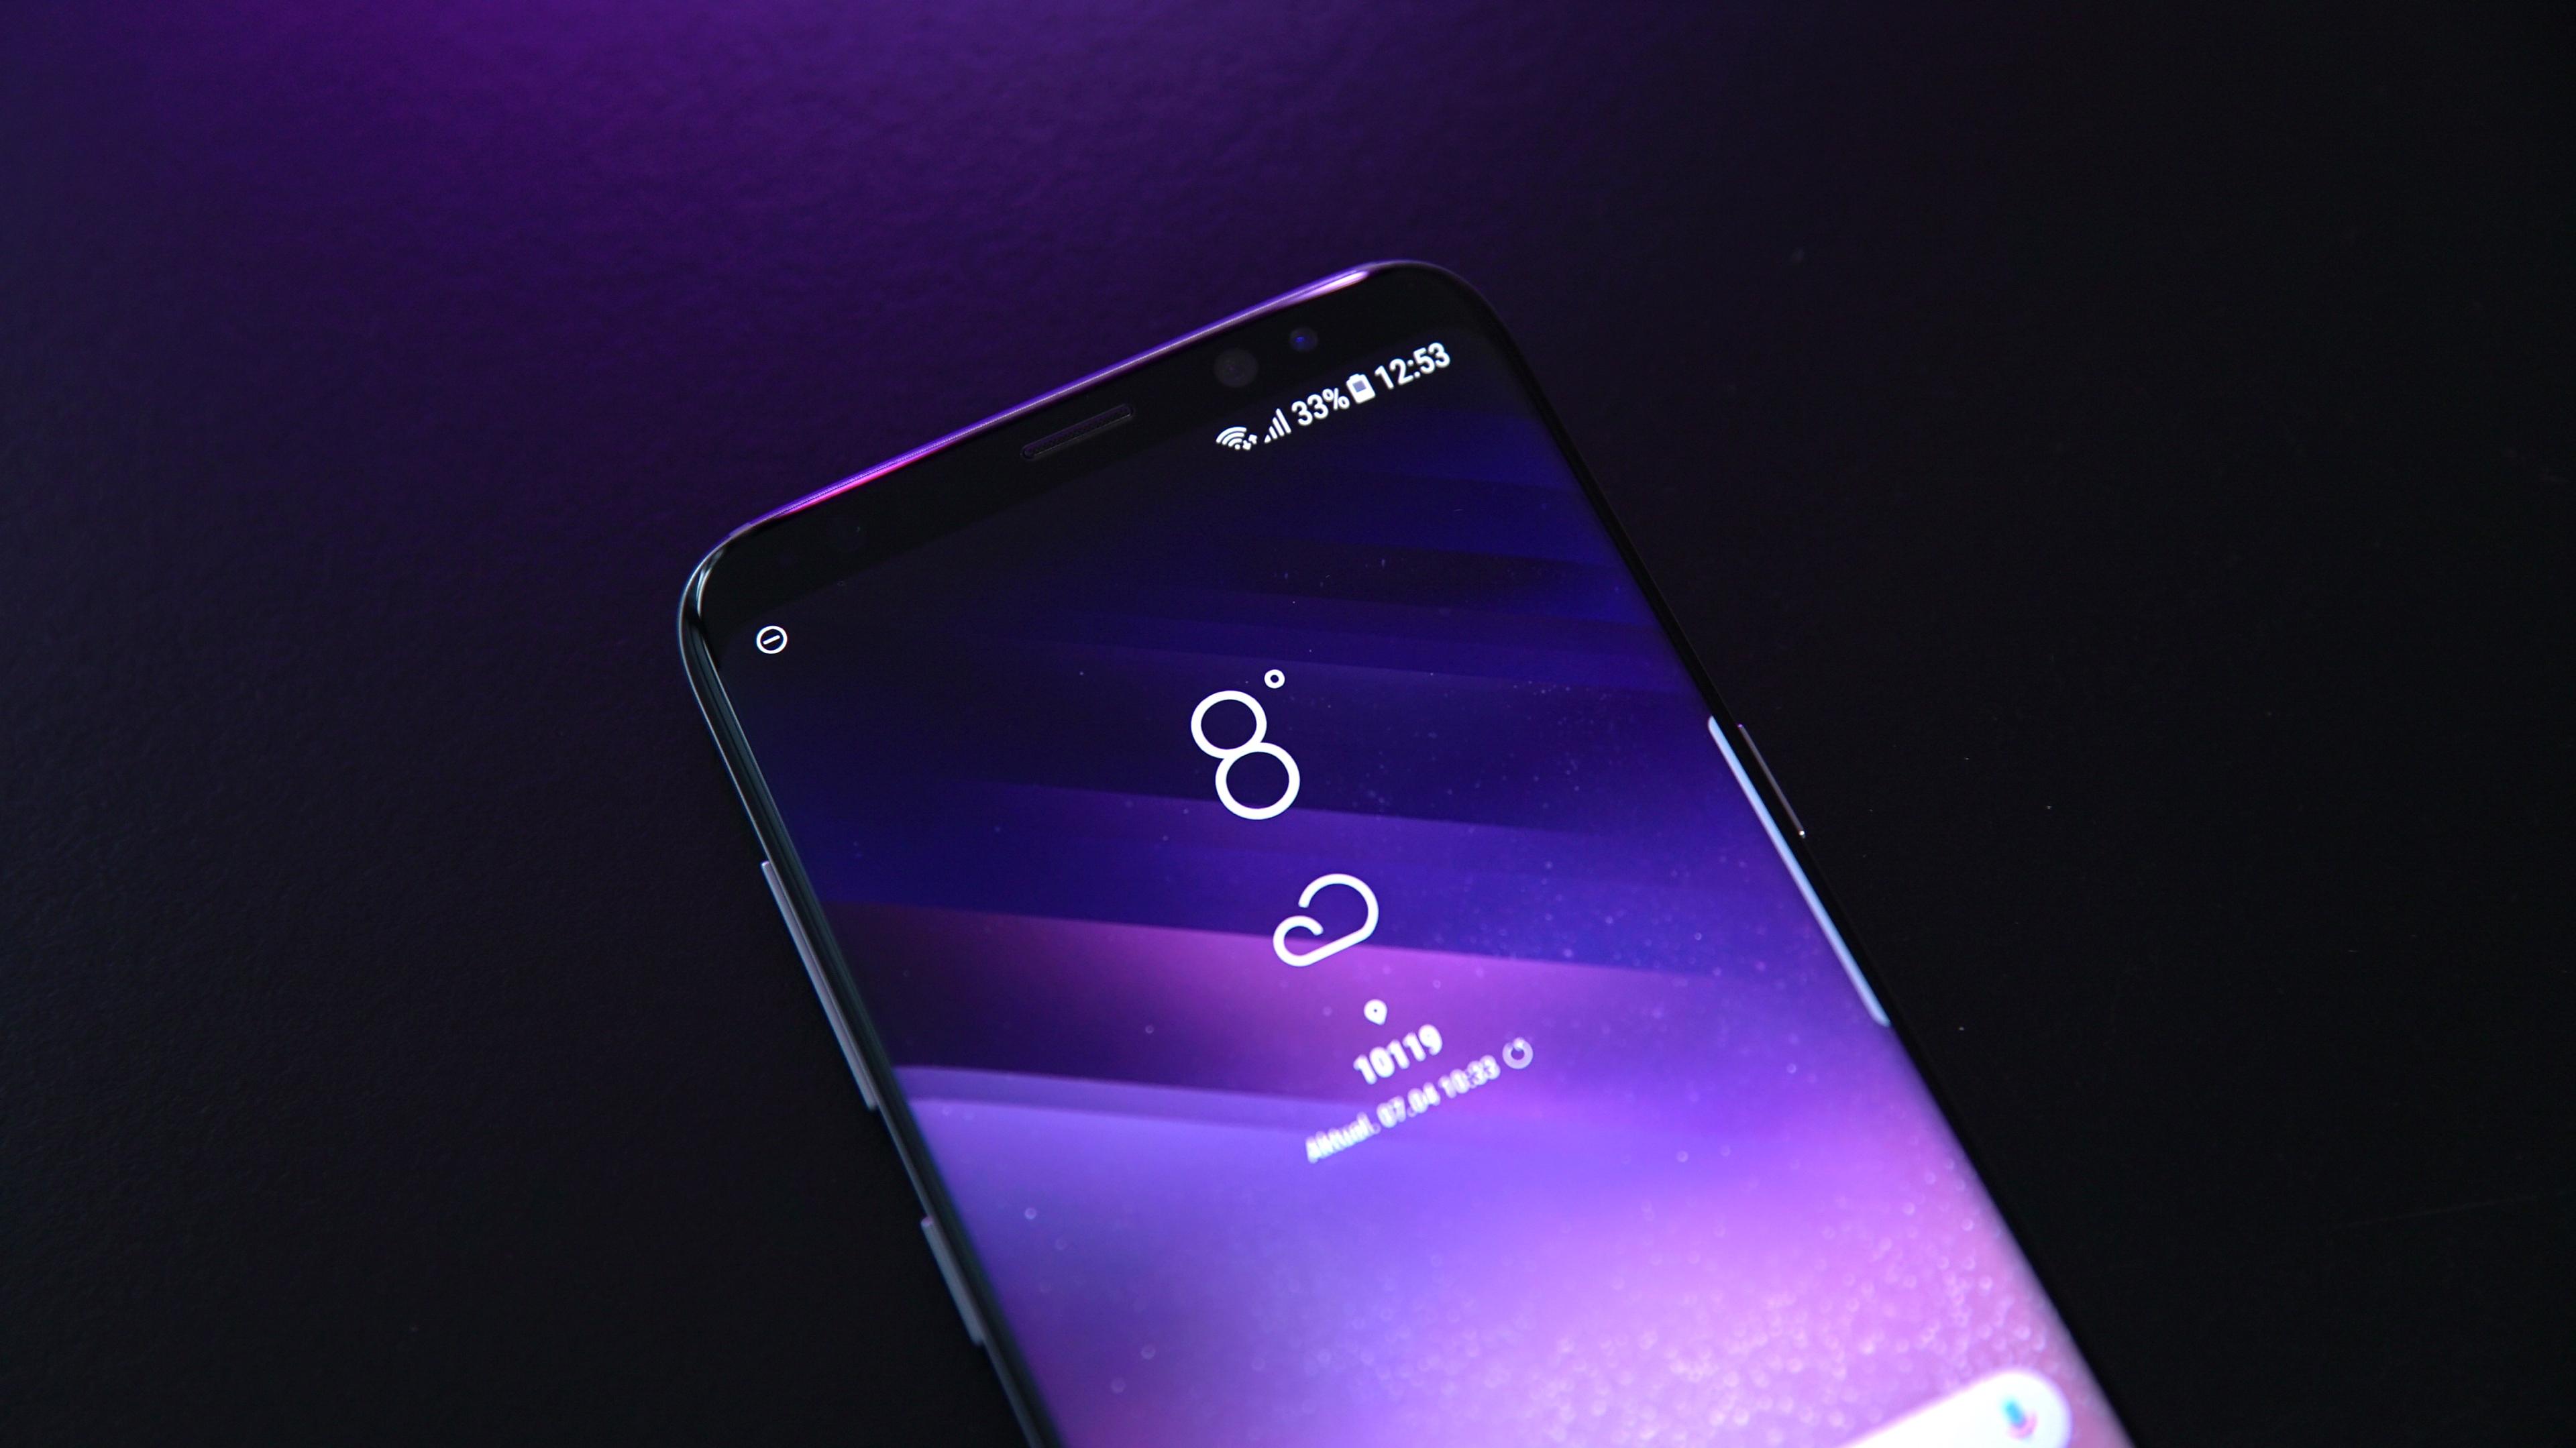 Samsung Galaxy S8 Test 9443